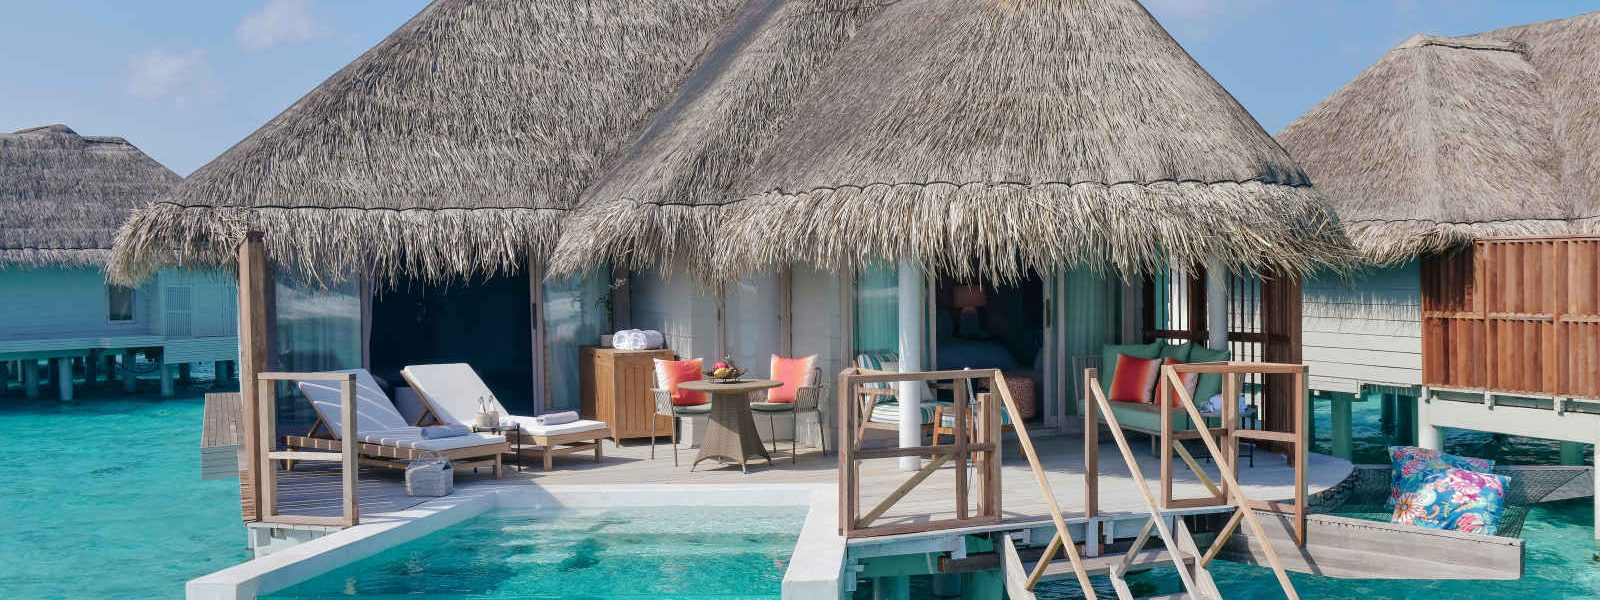 Grande villa sur pilotis avec piscine